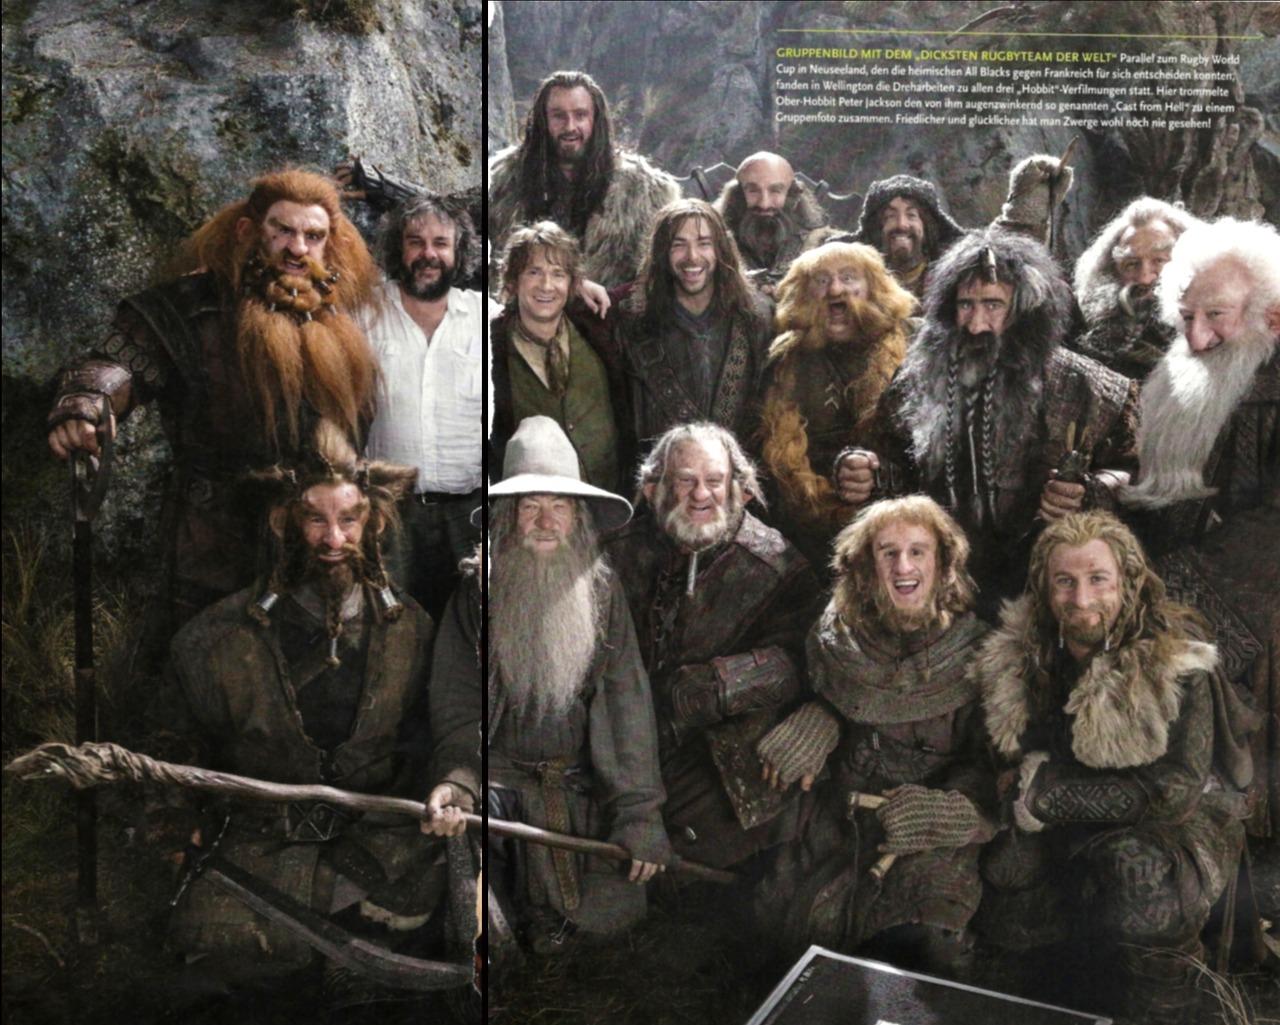 ... prologues: CINEMA Magazine offers a peek at The Desolation of Smaug Necromancer Hobbit Desolation Of Smaug